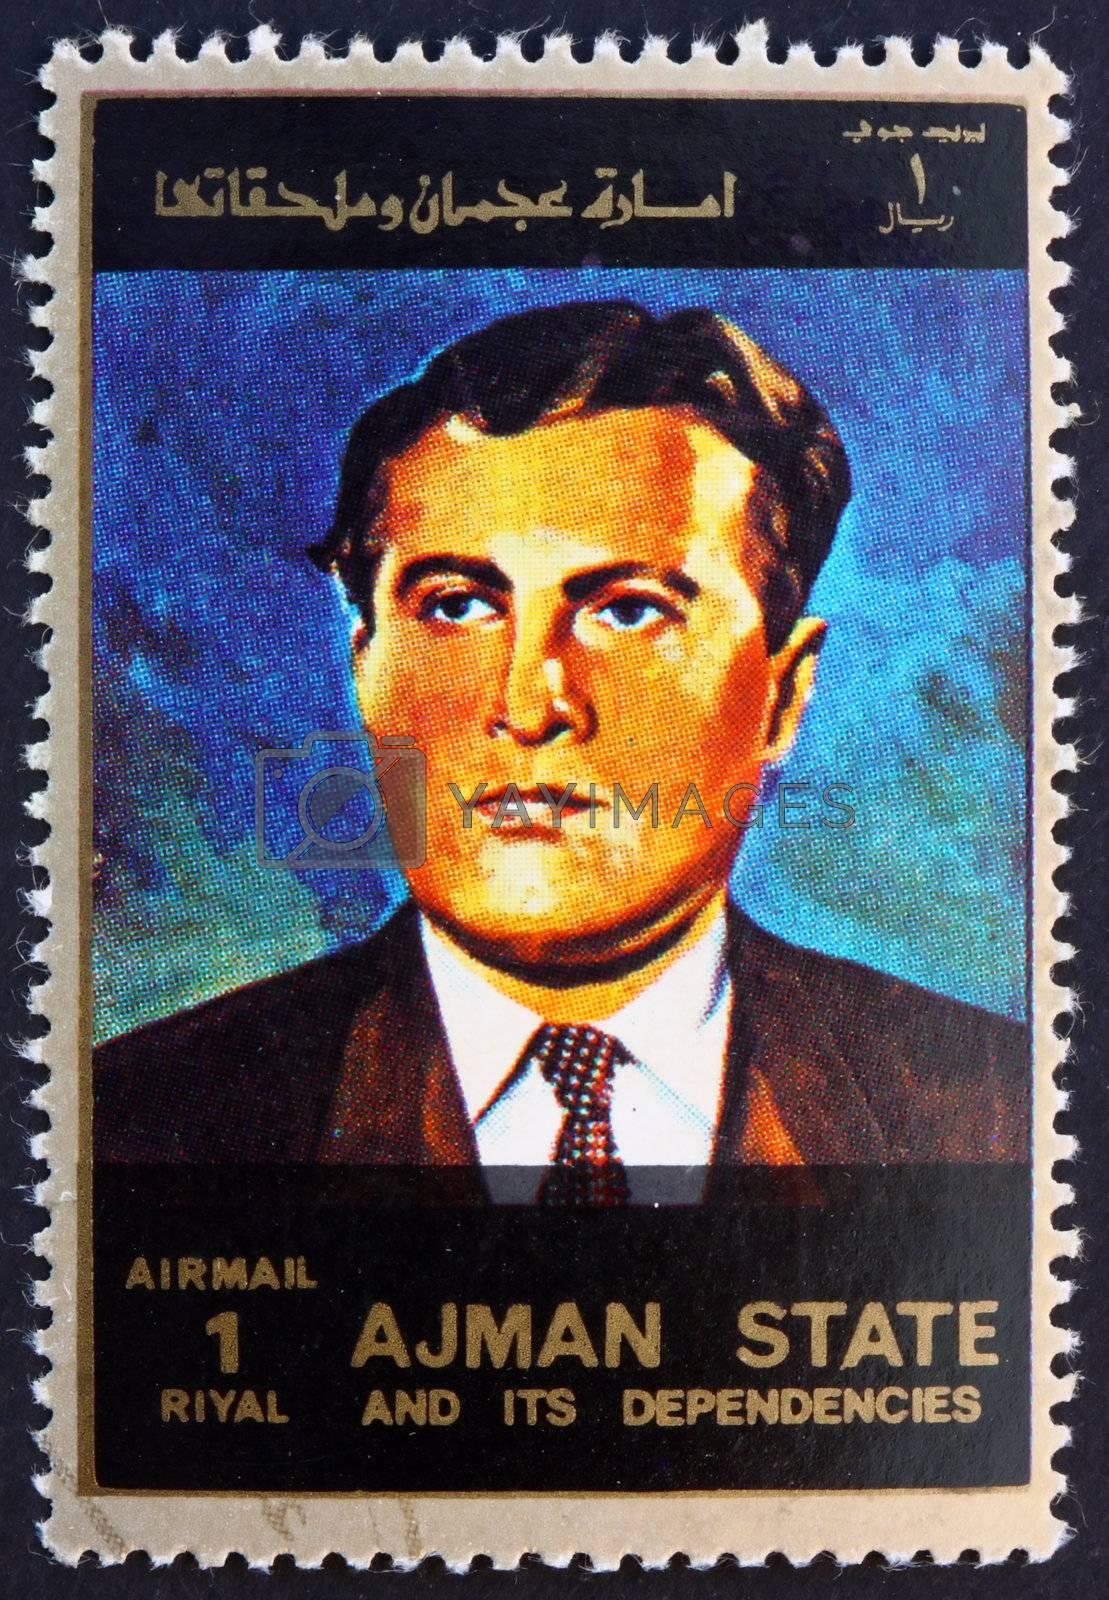 AJMAN - CIRCA 1973: a stamp printed in the Ajman shows Wernher von Braun, Rocket Scientist, Aerospace Engineer and Space Architect, circa 1973